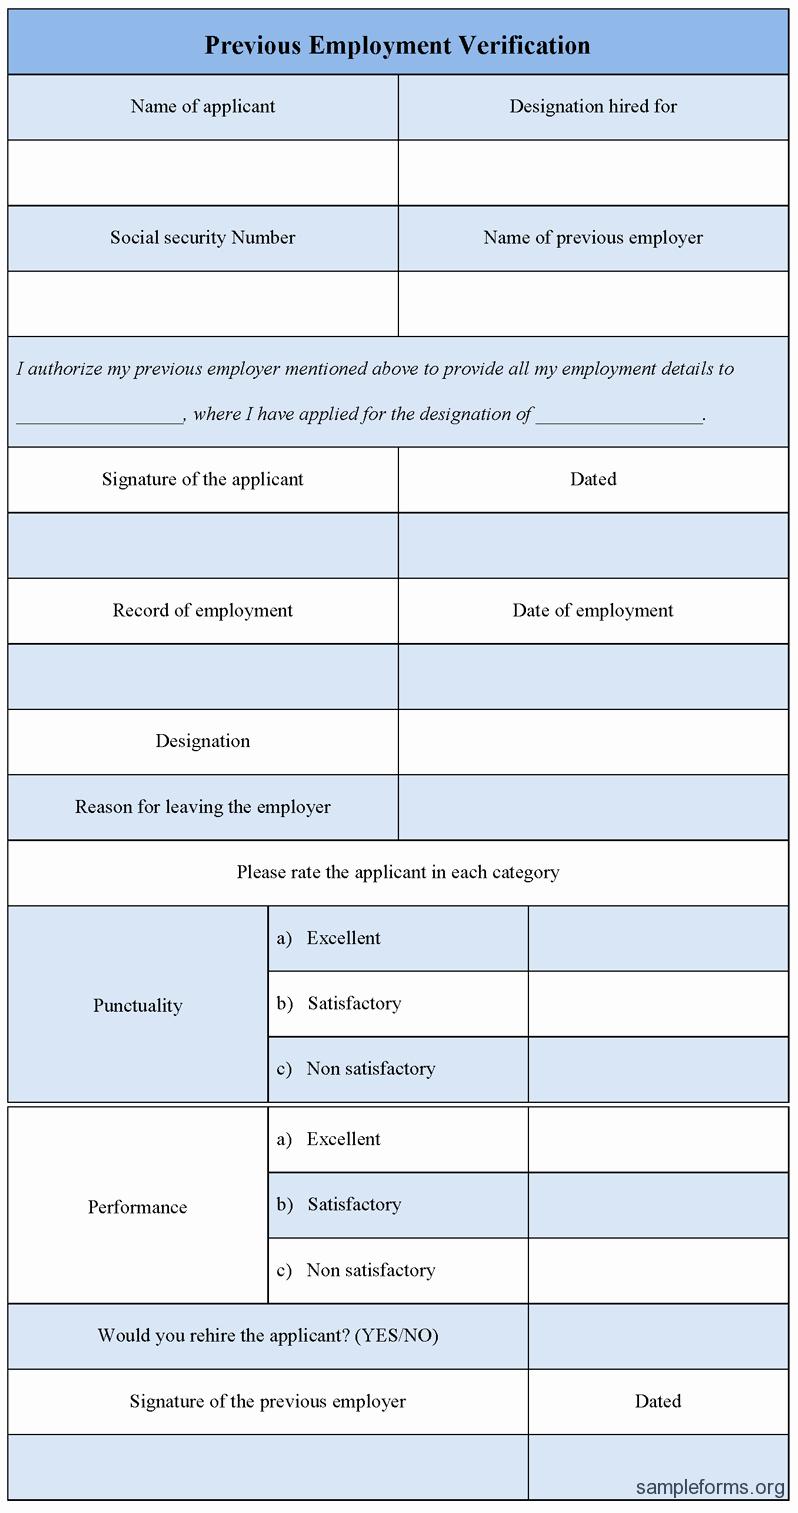 Previous Employment Verification form Sample forms